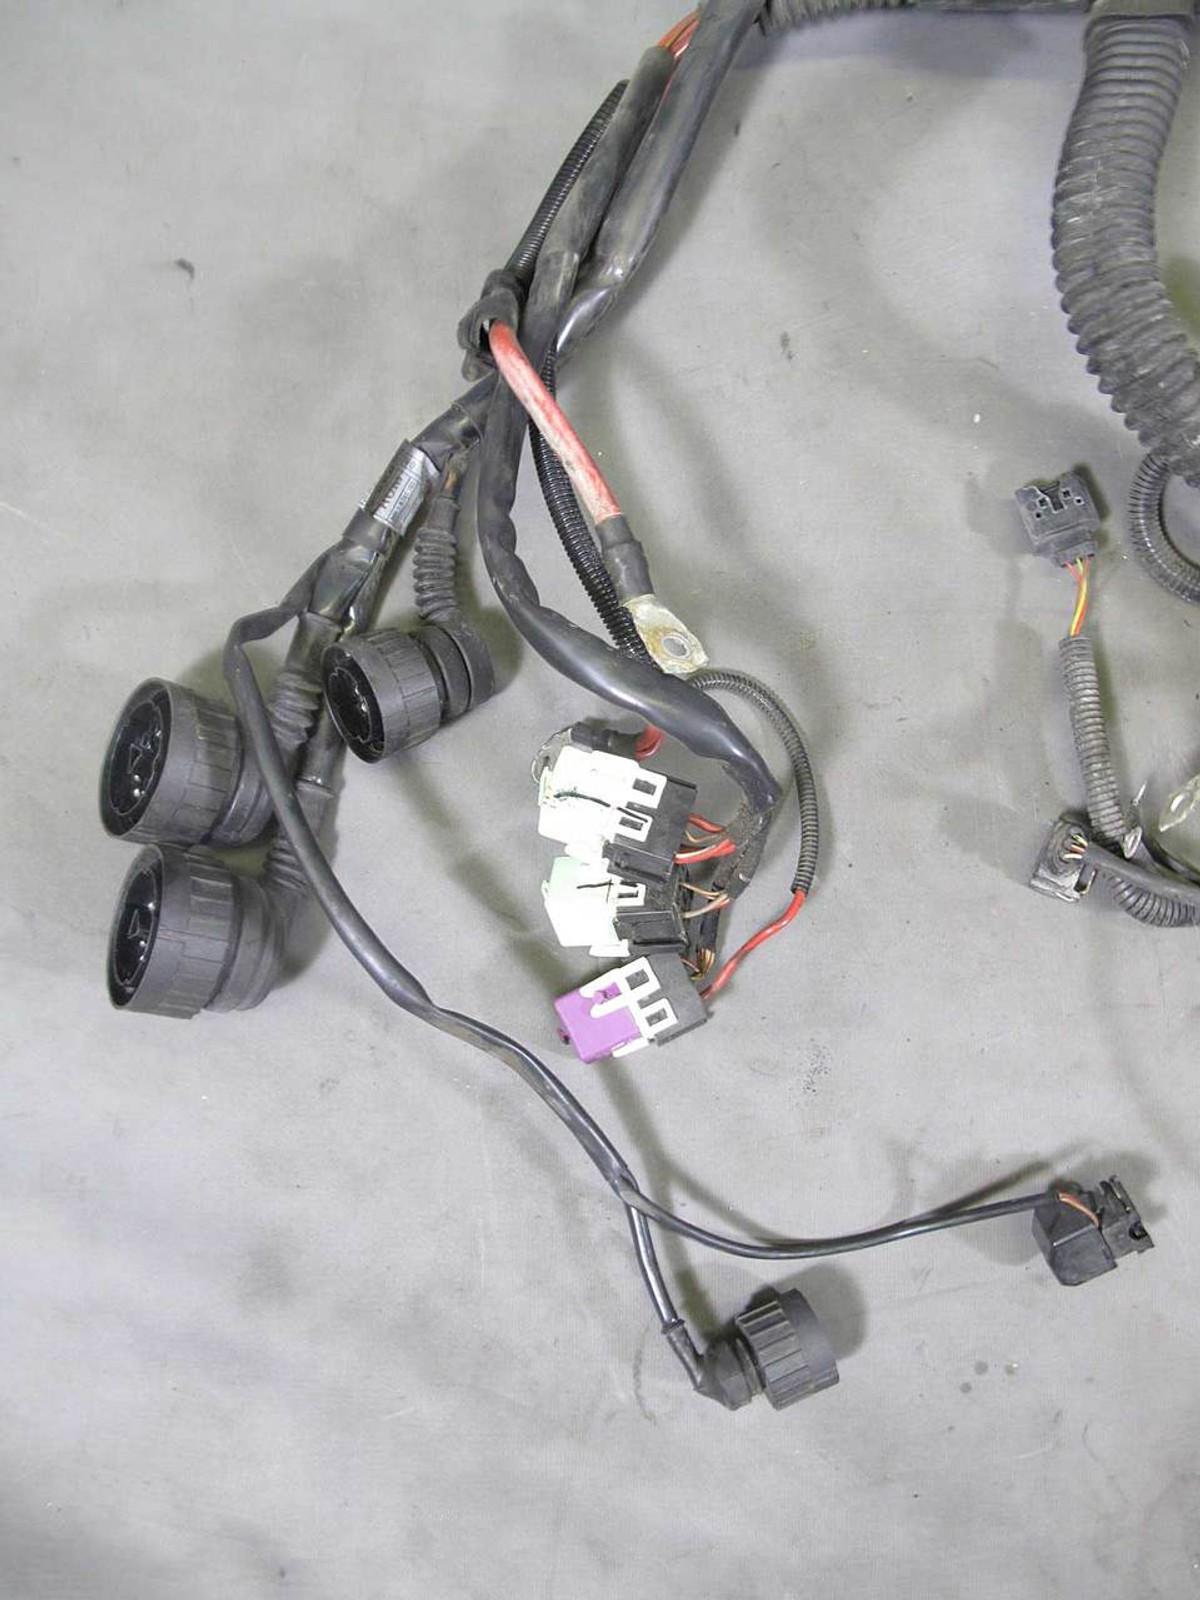 1996 Bmw 328i Wiring Harness - Wiring Diagrams Schematics